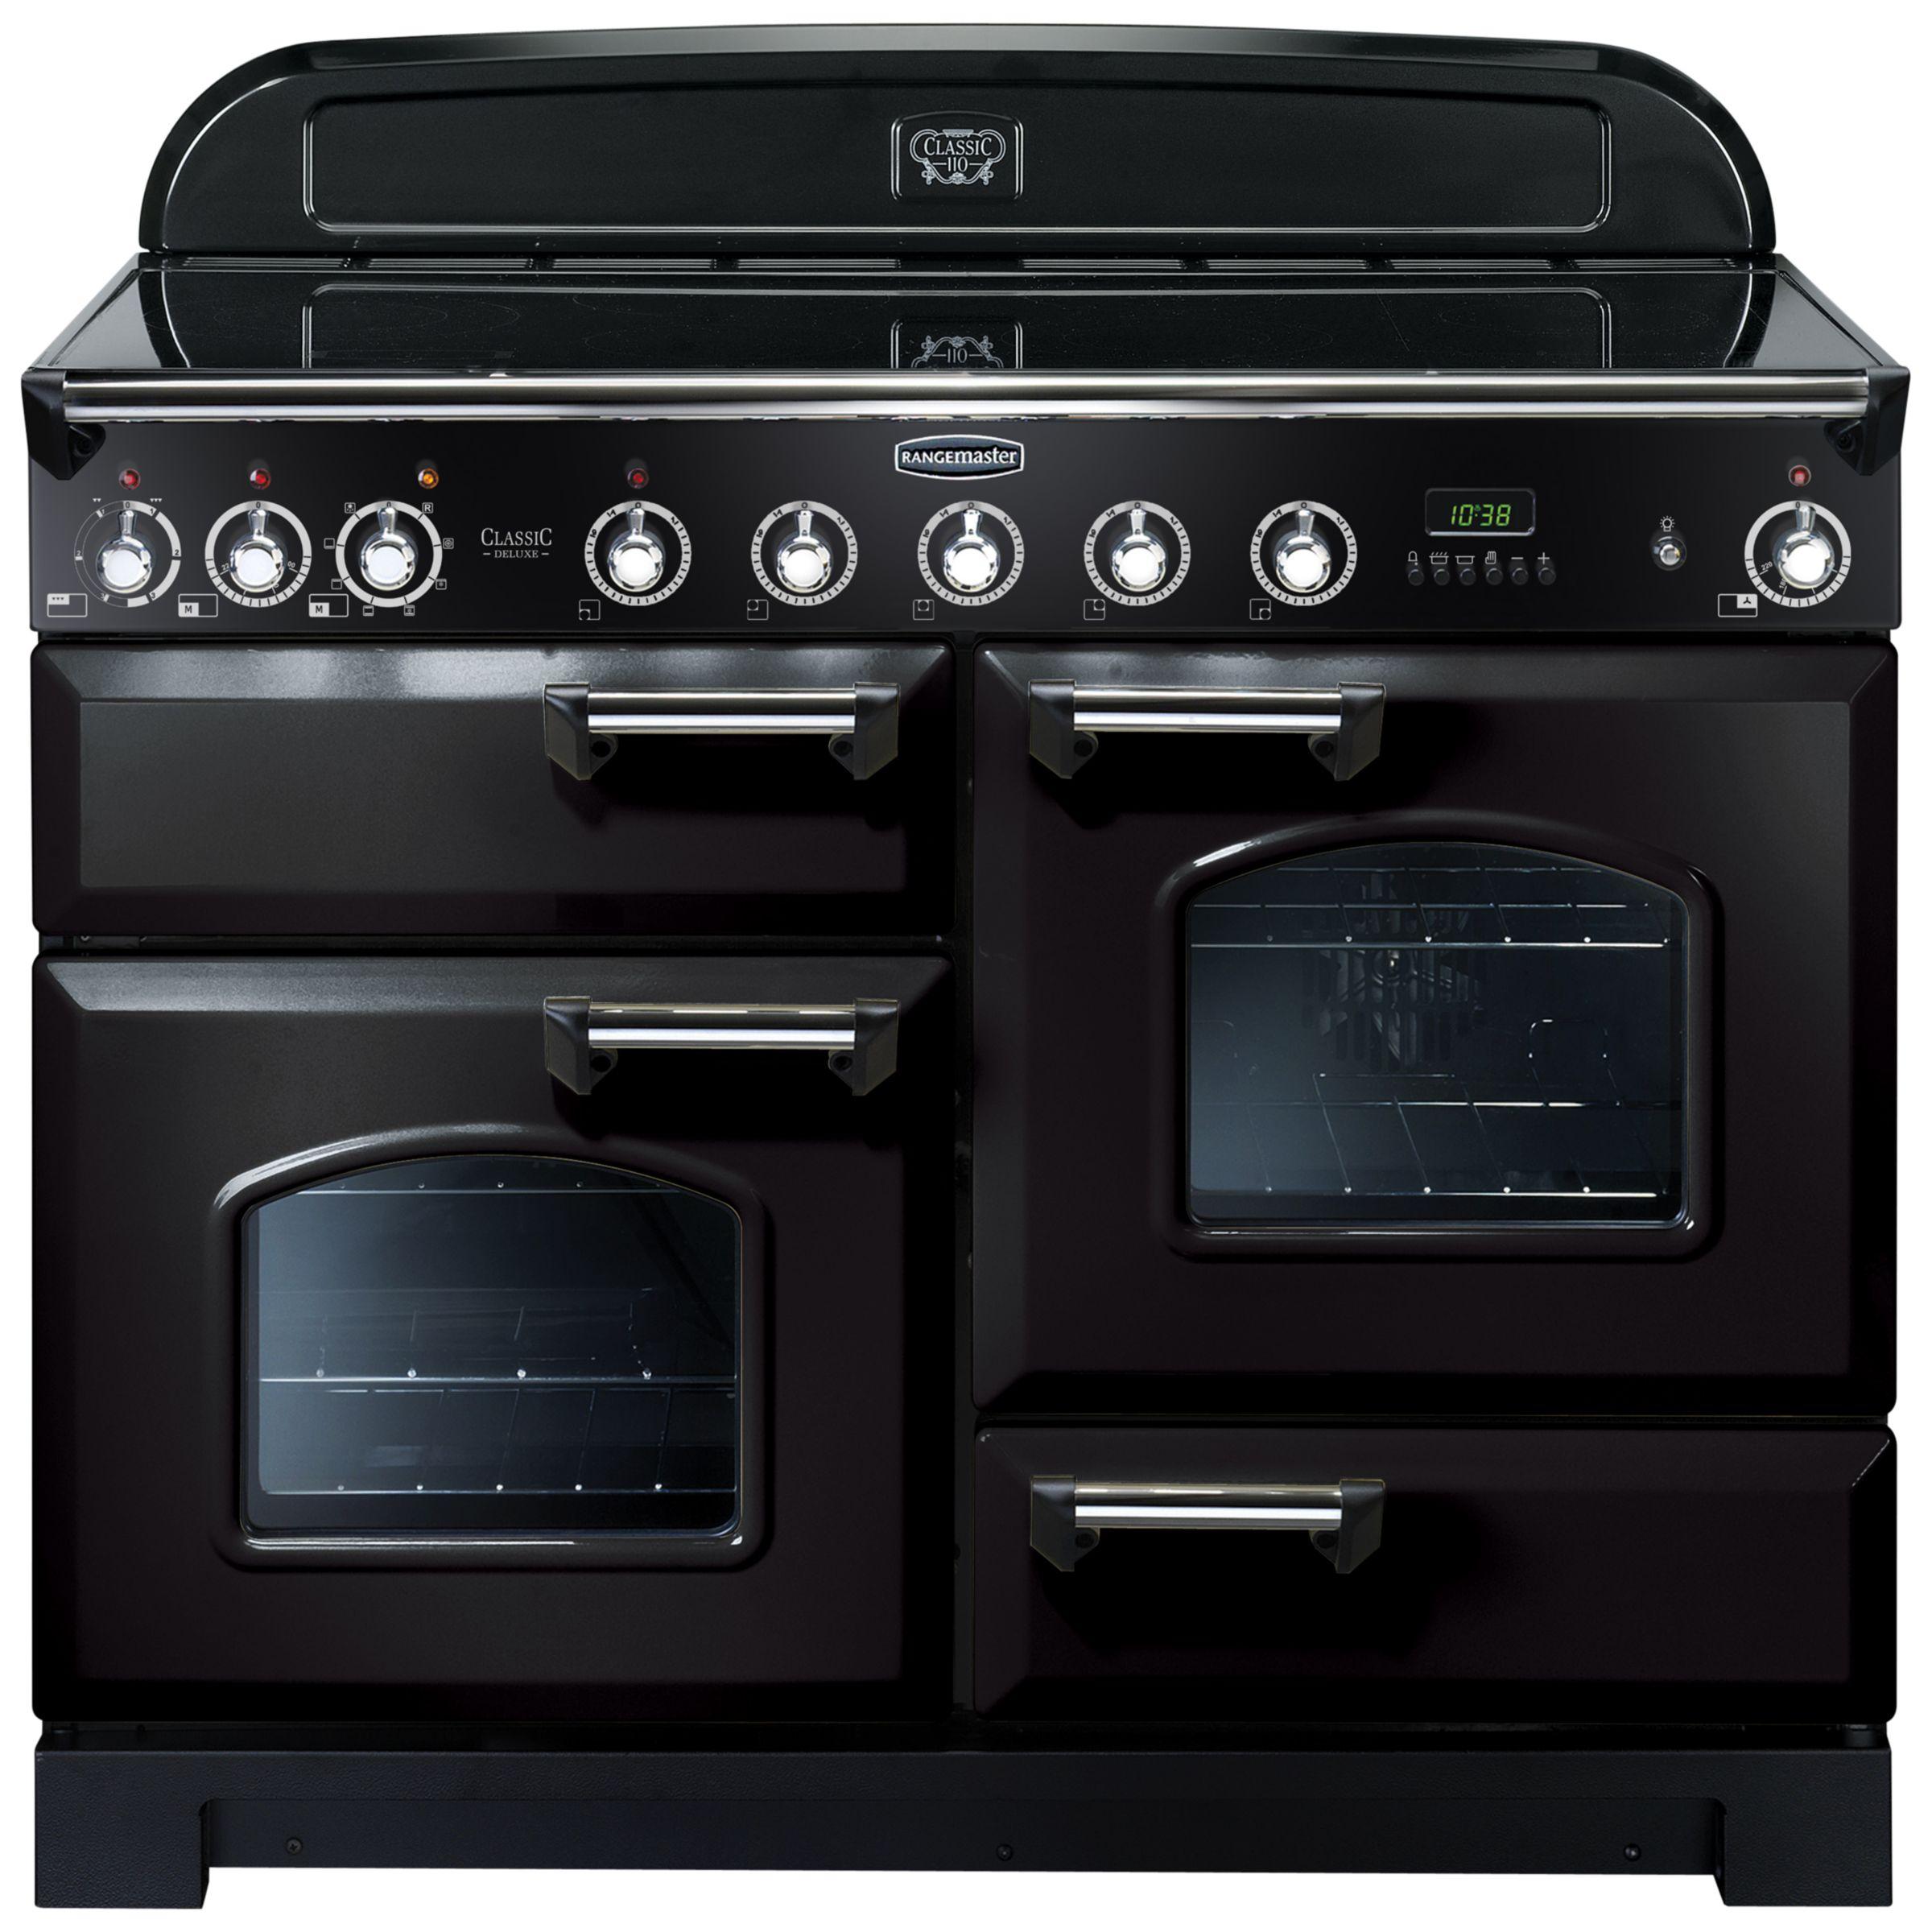 Rangemaster Classic Deluxe 110 Induction Hob Range Cooker Black